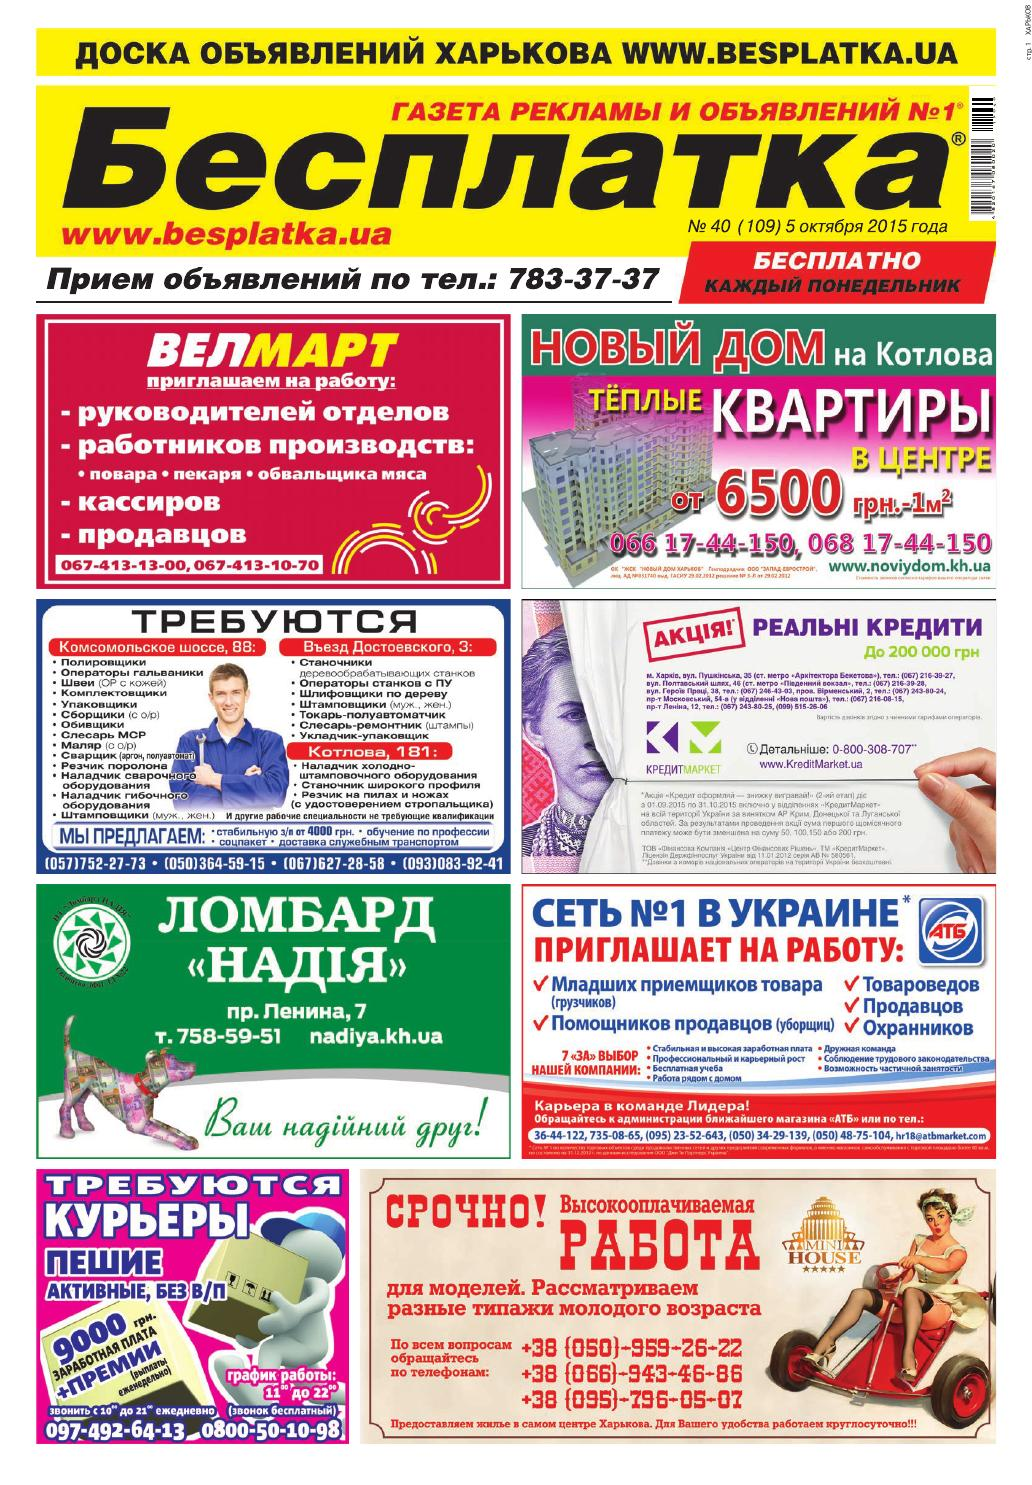 c8cbcd0f5a4e Besplatka  40 Харьков by besplatka ukraine - issuu